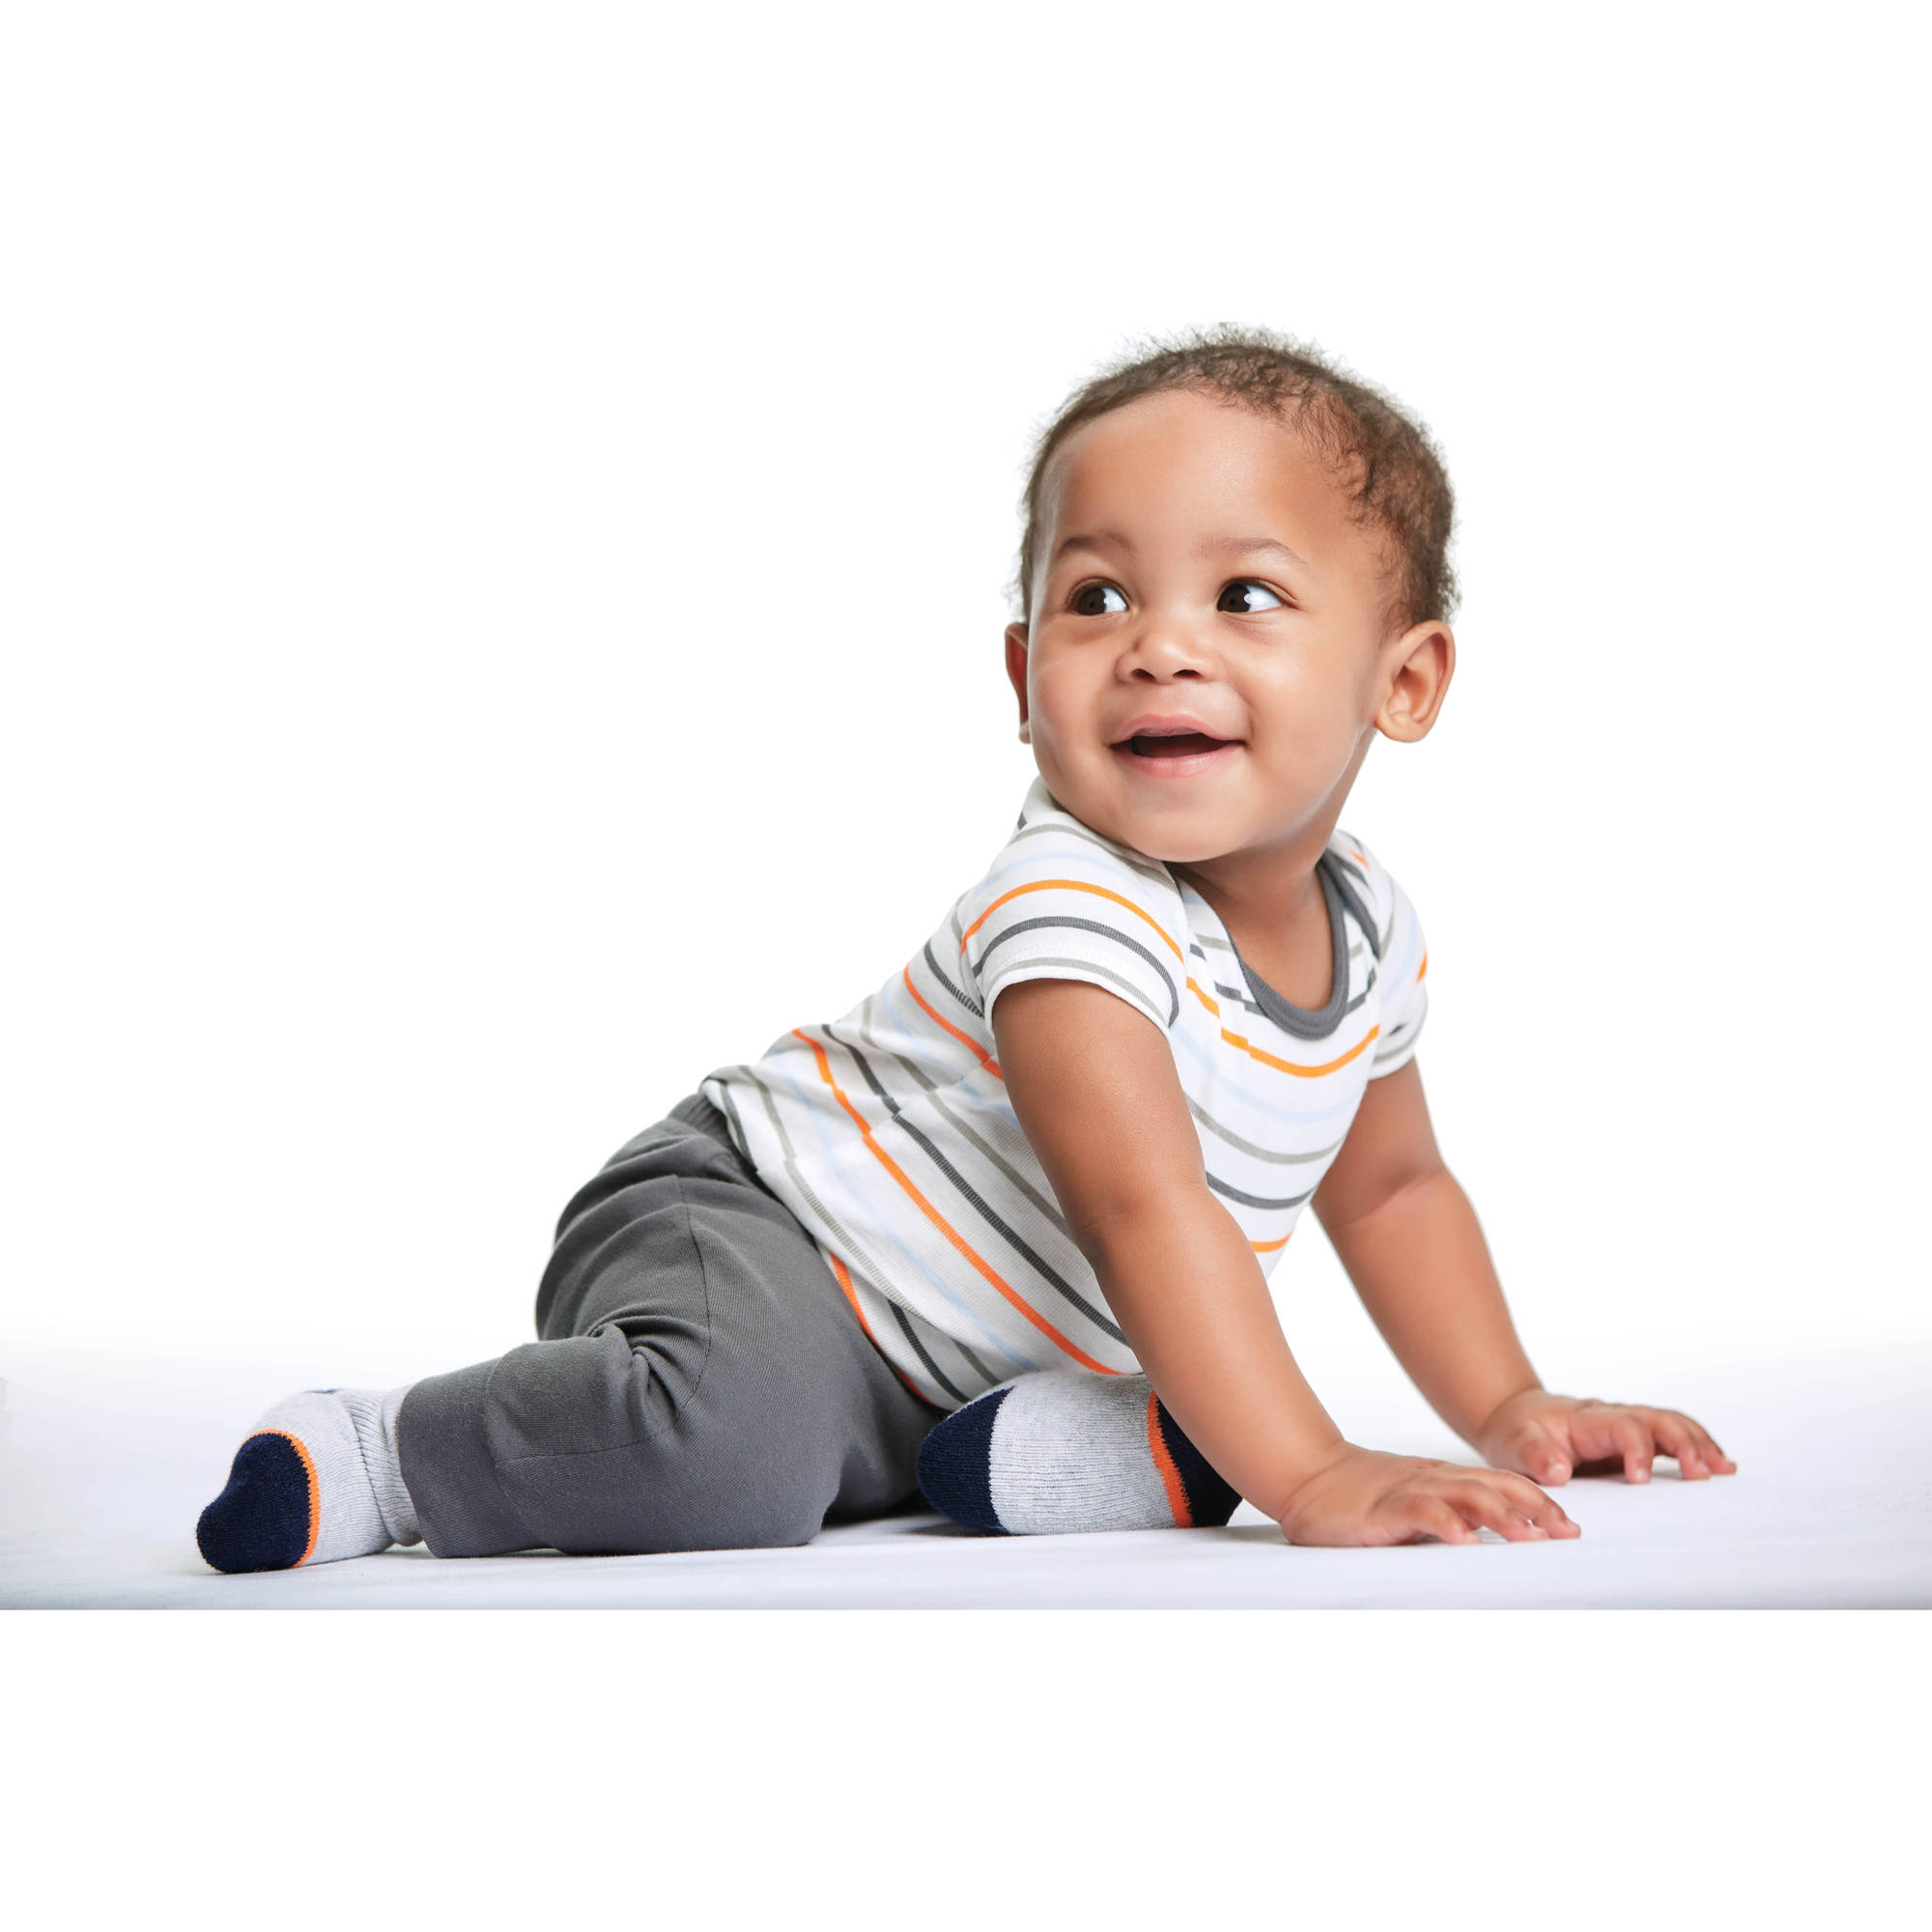 Pen Ear Buds in Pocket1 Baby Newborn Crawling Suit Sleeveless Onesie Romper Jumpsuit Black Glasses